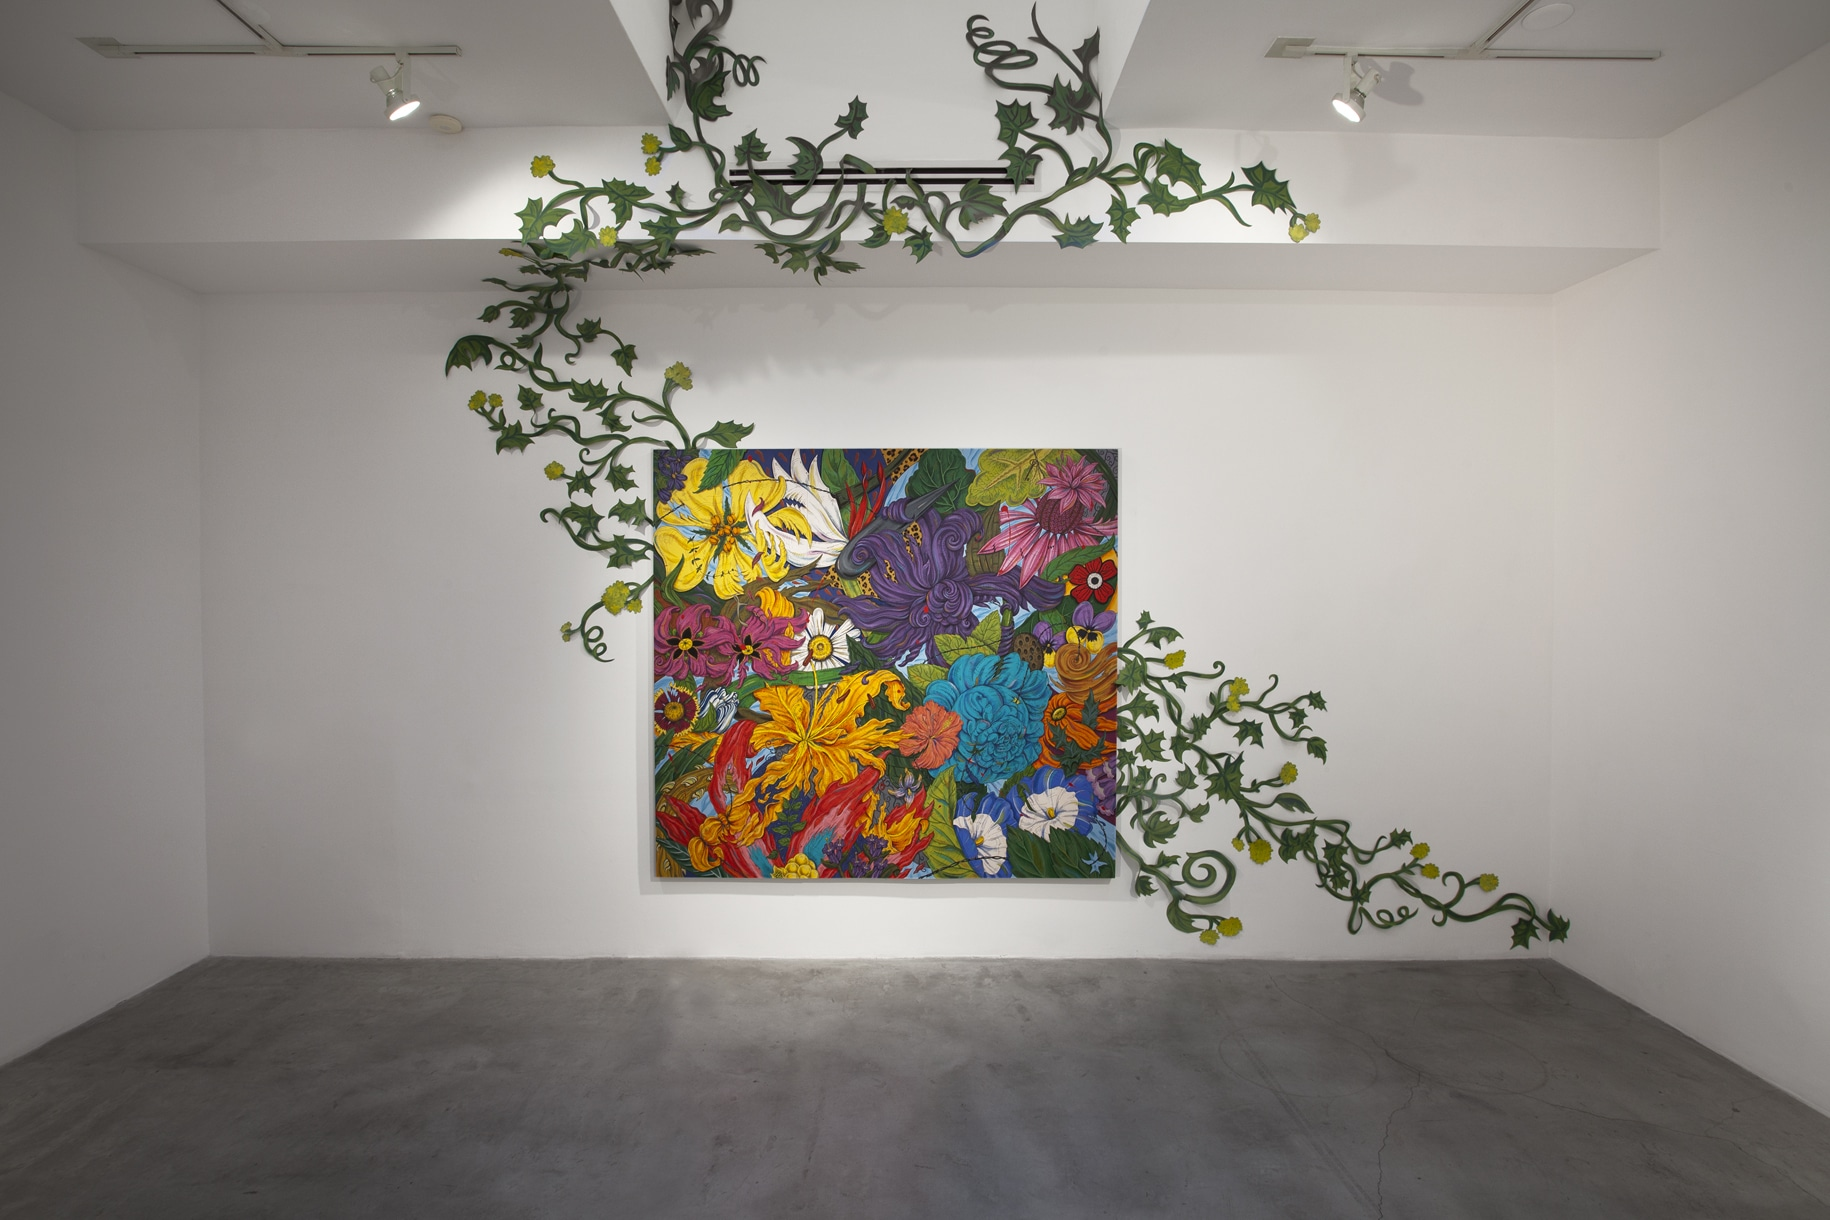 Penelope Gottlieb's work in the Edward Cella Gallery, Los Angeles.